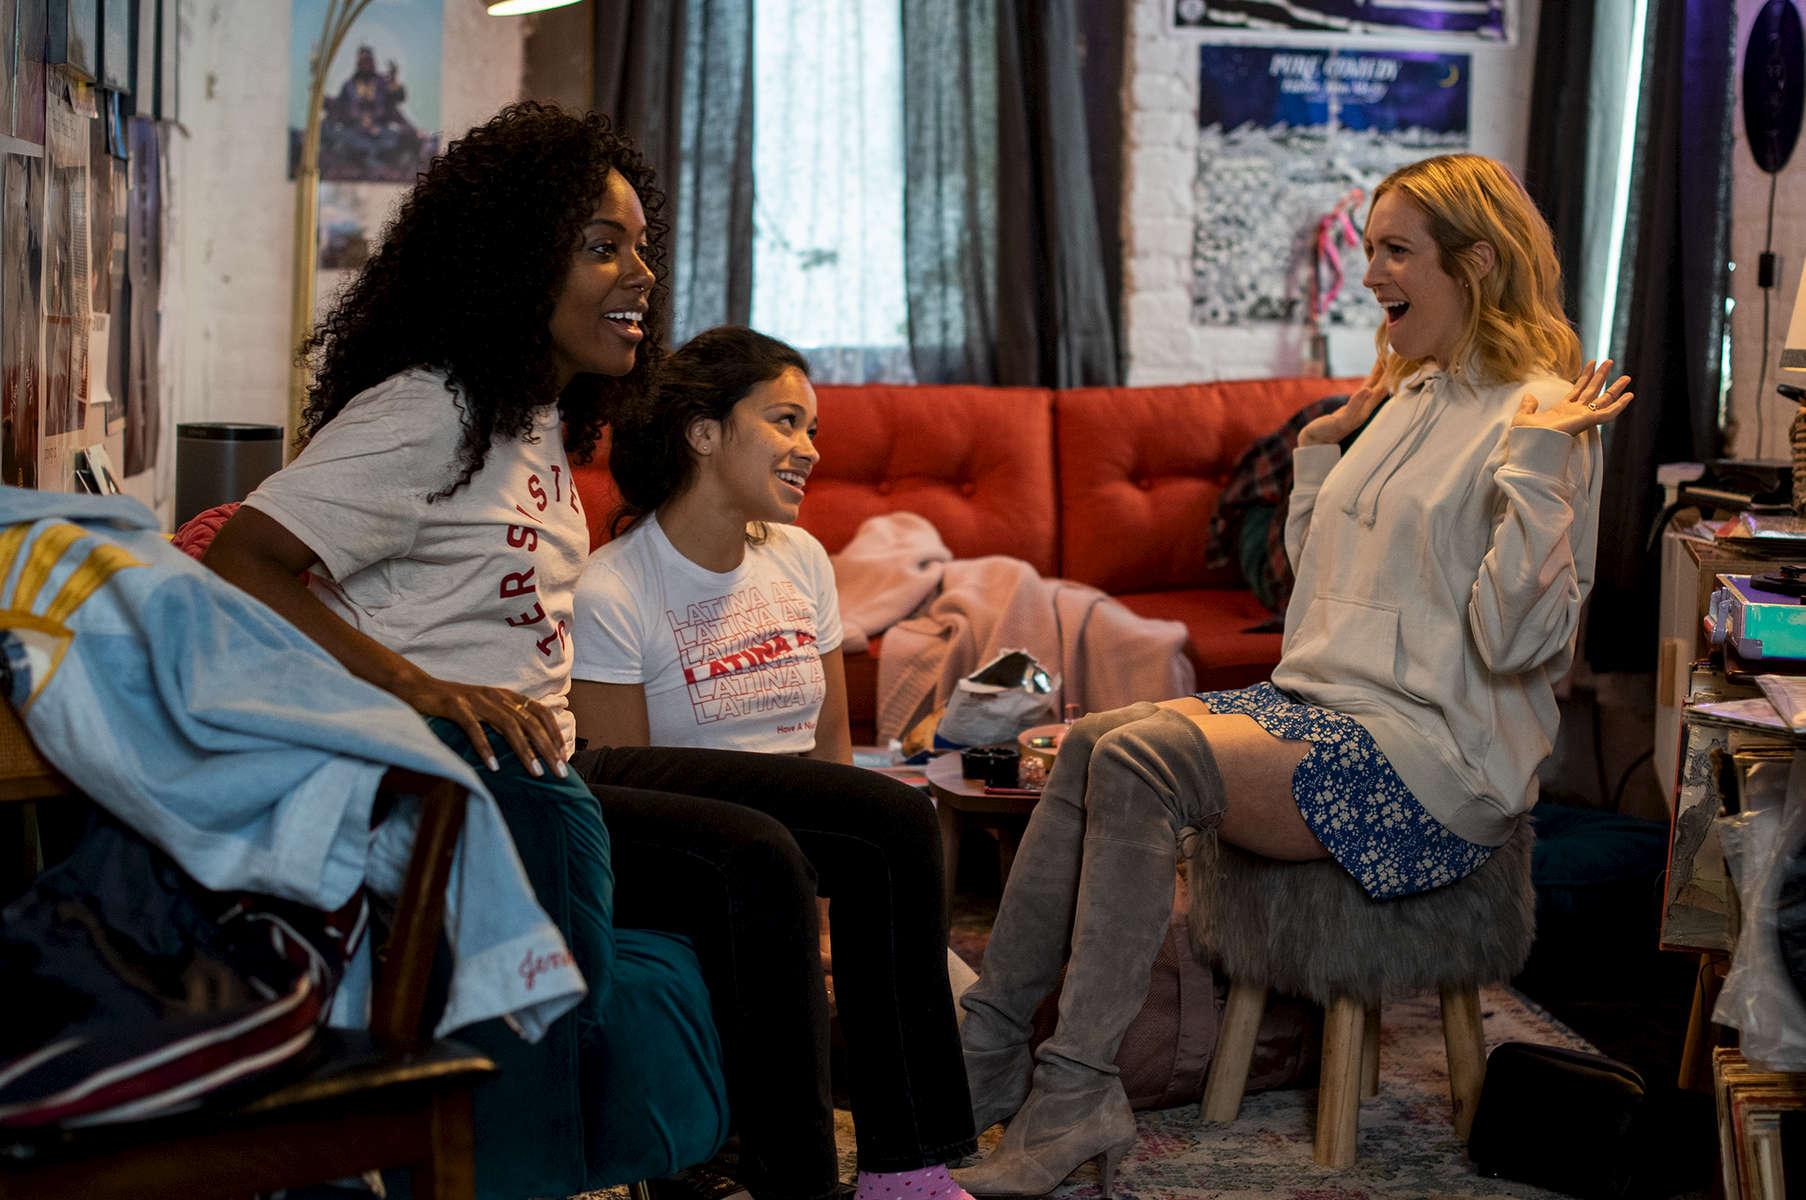 DaWanda Wise, Gina Rodriguez, Brittany Snow,